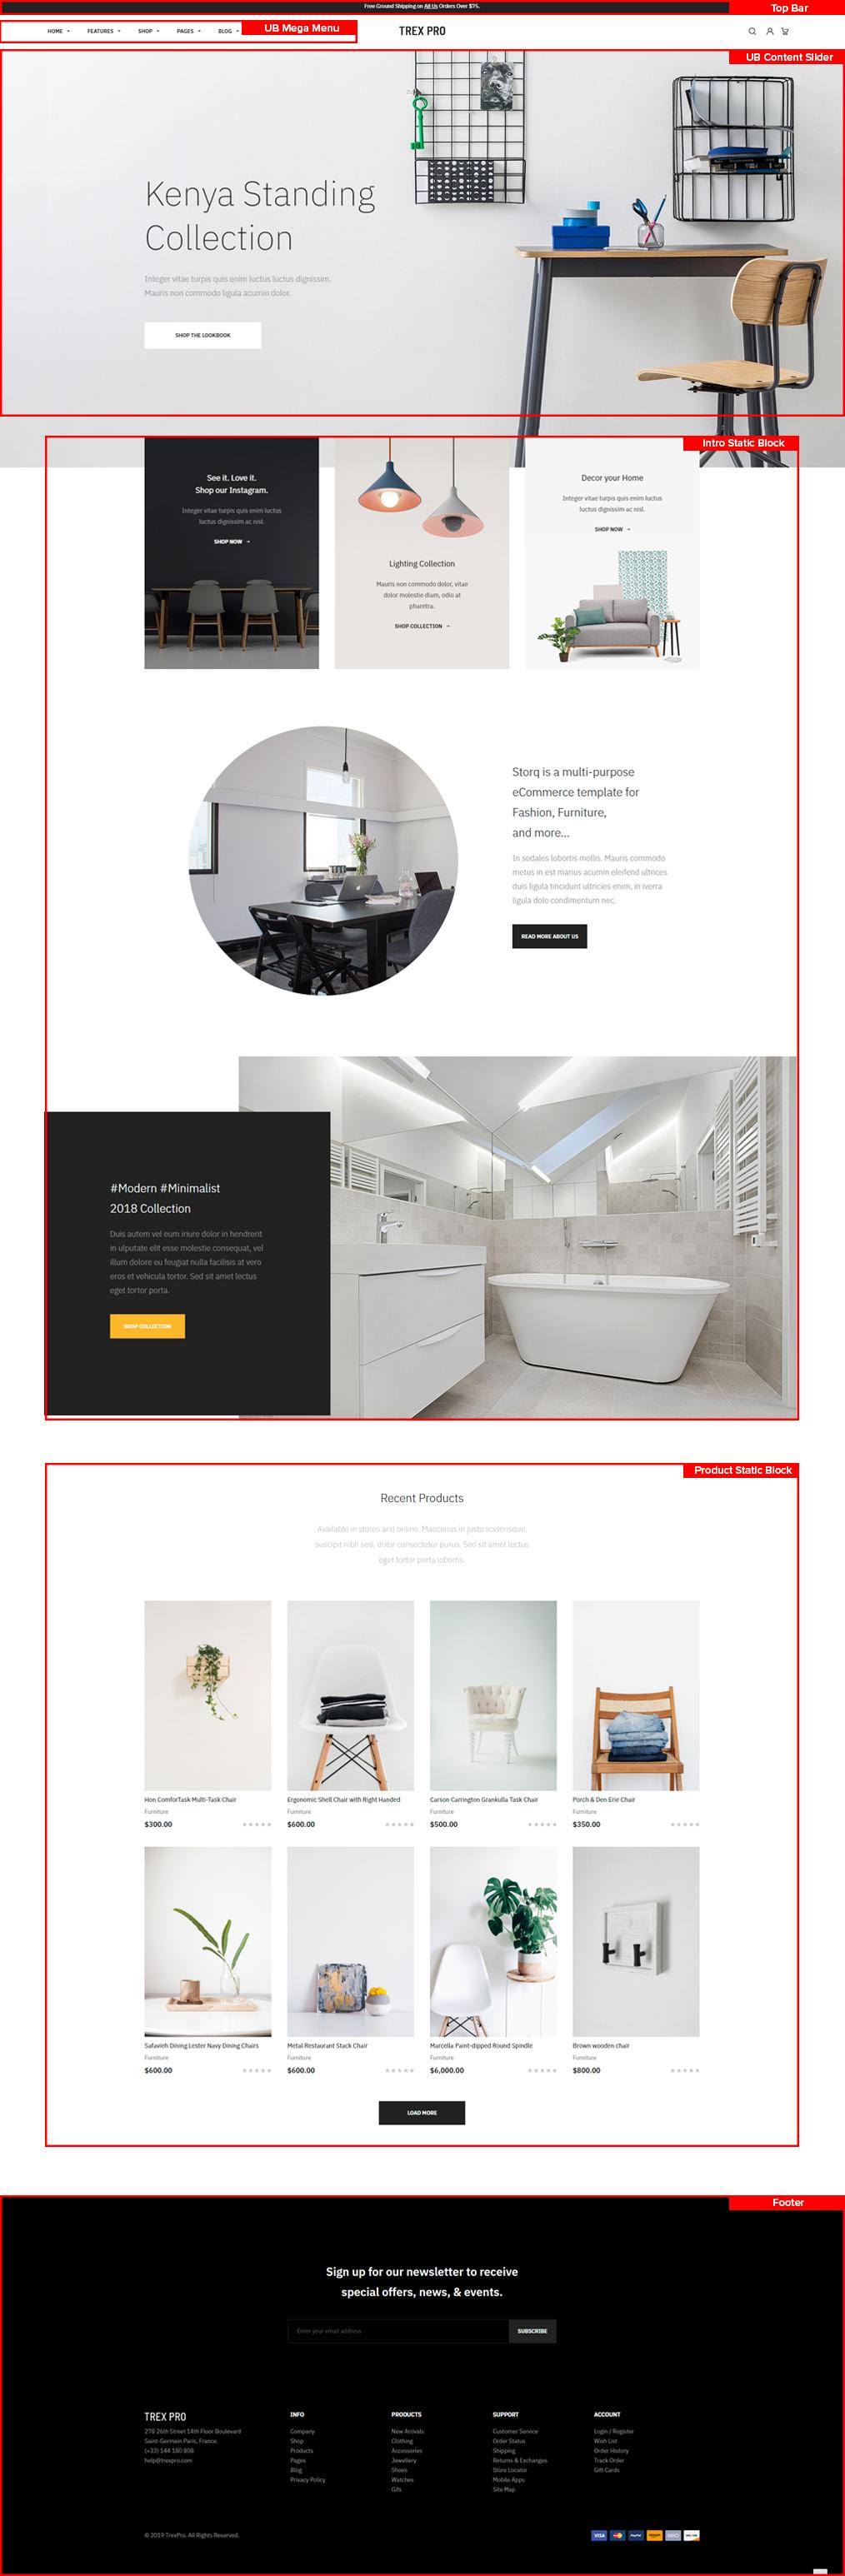 UB Trex Pro Furniture Homepage